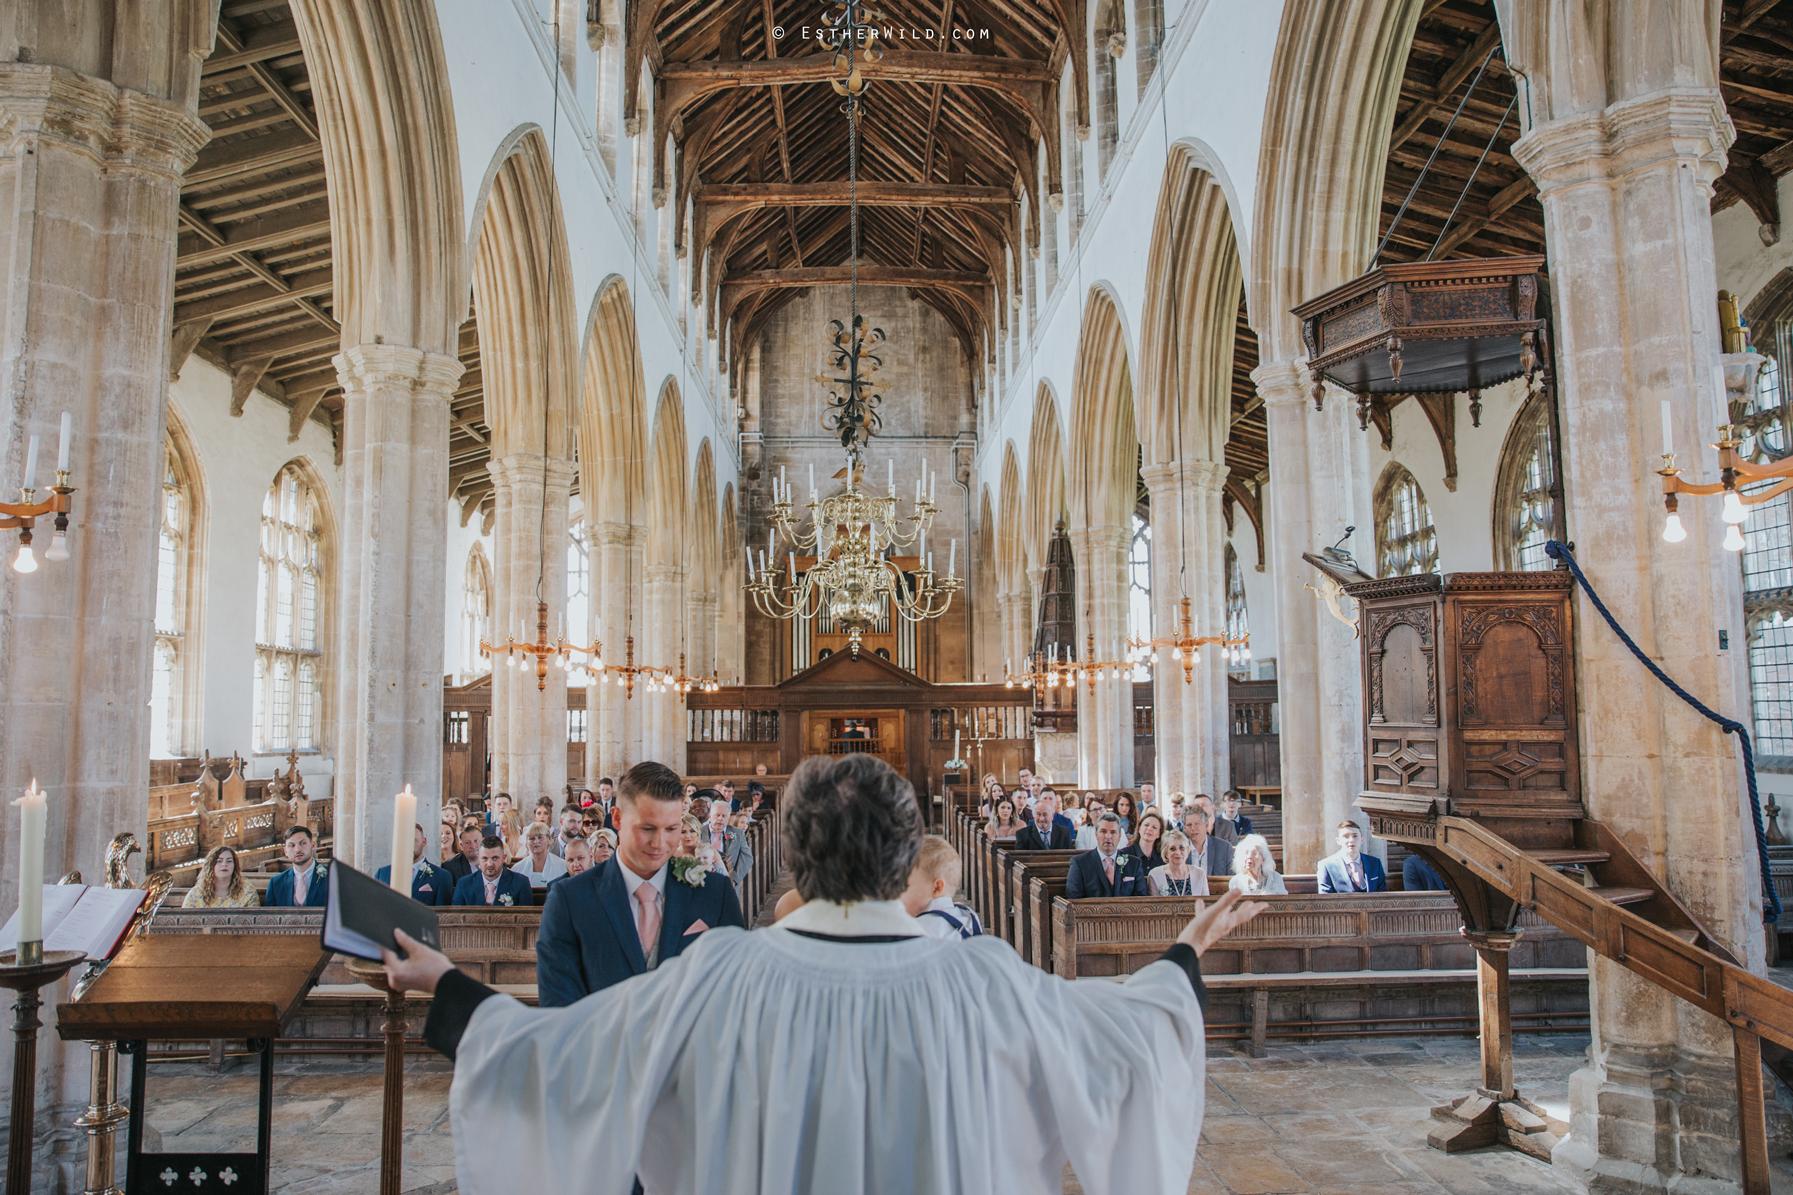 IMG_0471Walpole_St_Andrew_Church_Norfolk_Wedding_Copyright_Esther_Wild_Photographer_.jpg